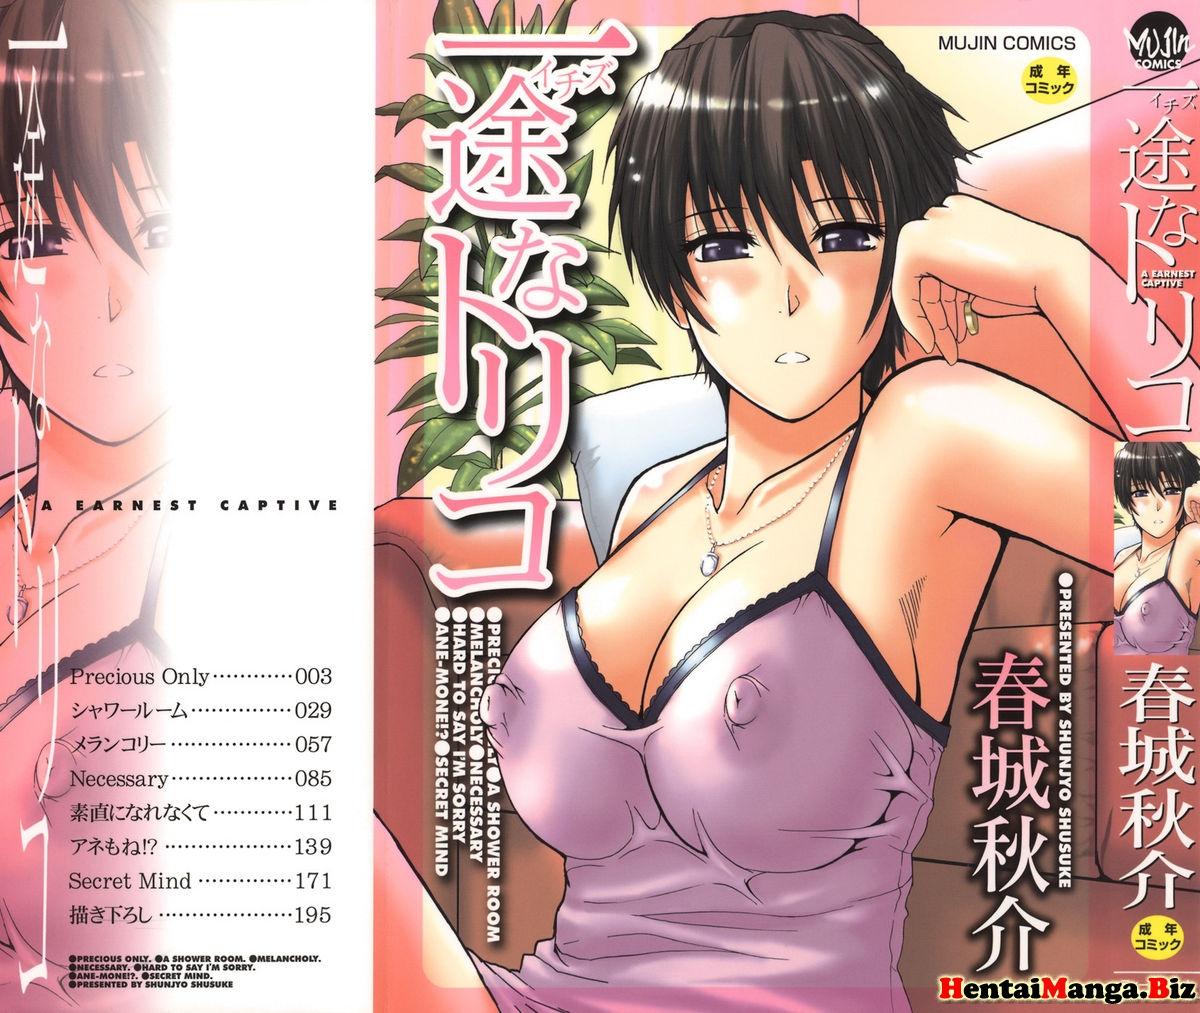 Incest Hentai - [Shunjyo Shusuke] Ichizu na Toriko - A Earnest Captive (spanish)-Read-Hentai-Manga-Onlnie